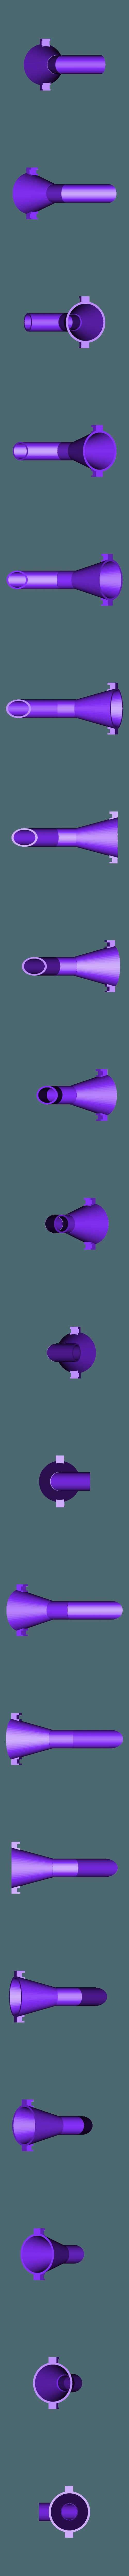 water_spout_v2.stl Download free STL file water dispenser diverter • 3D printable template, drykill_23